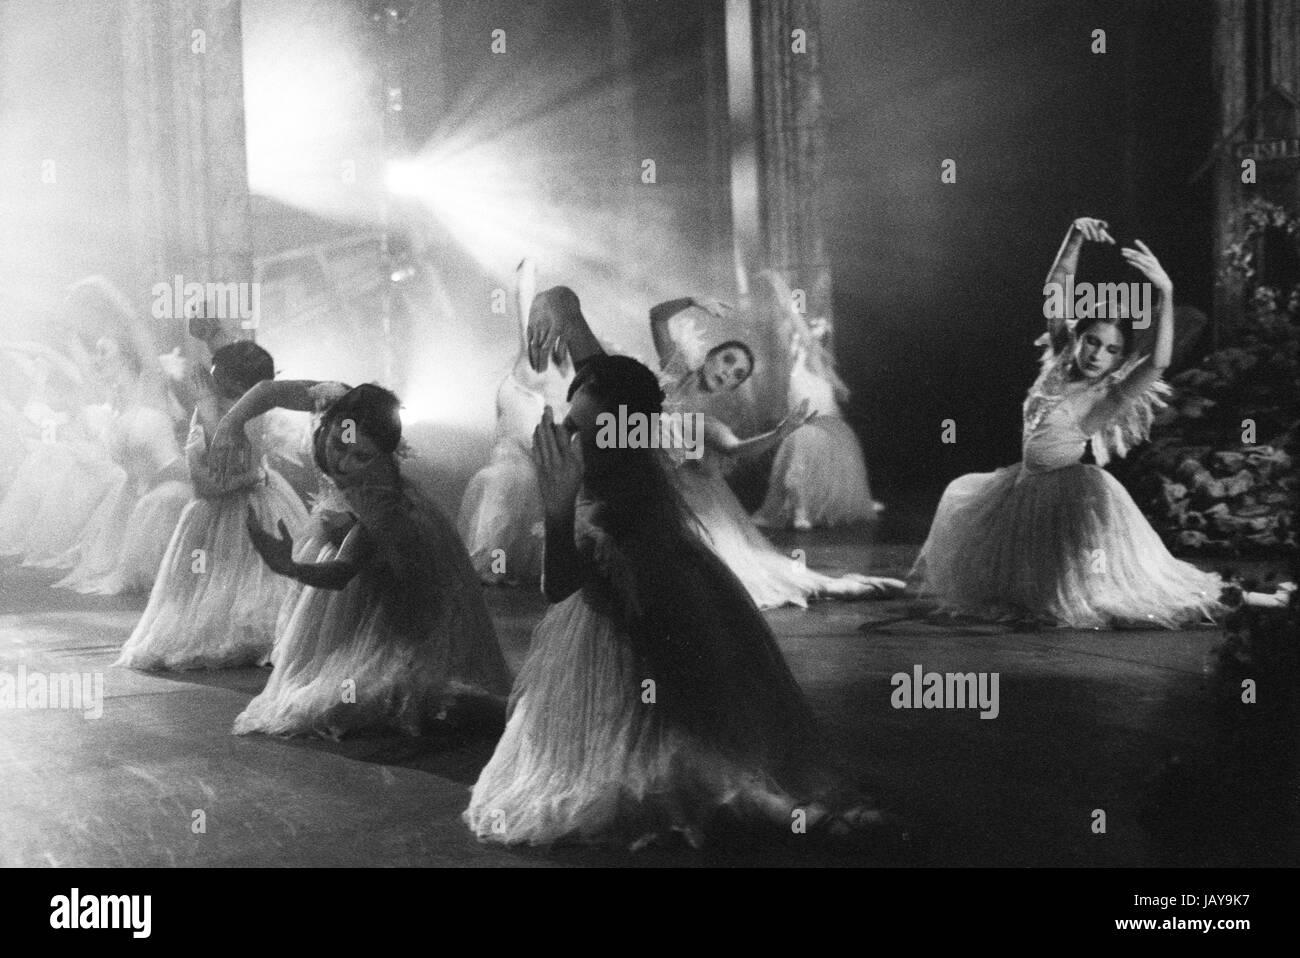 Birmingham Royal Ballet (BRB) corps wilis in Galina Samsova's Giselle, Act II. Music: Adolphe Adam. - Stock Image